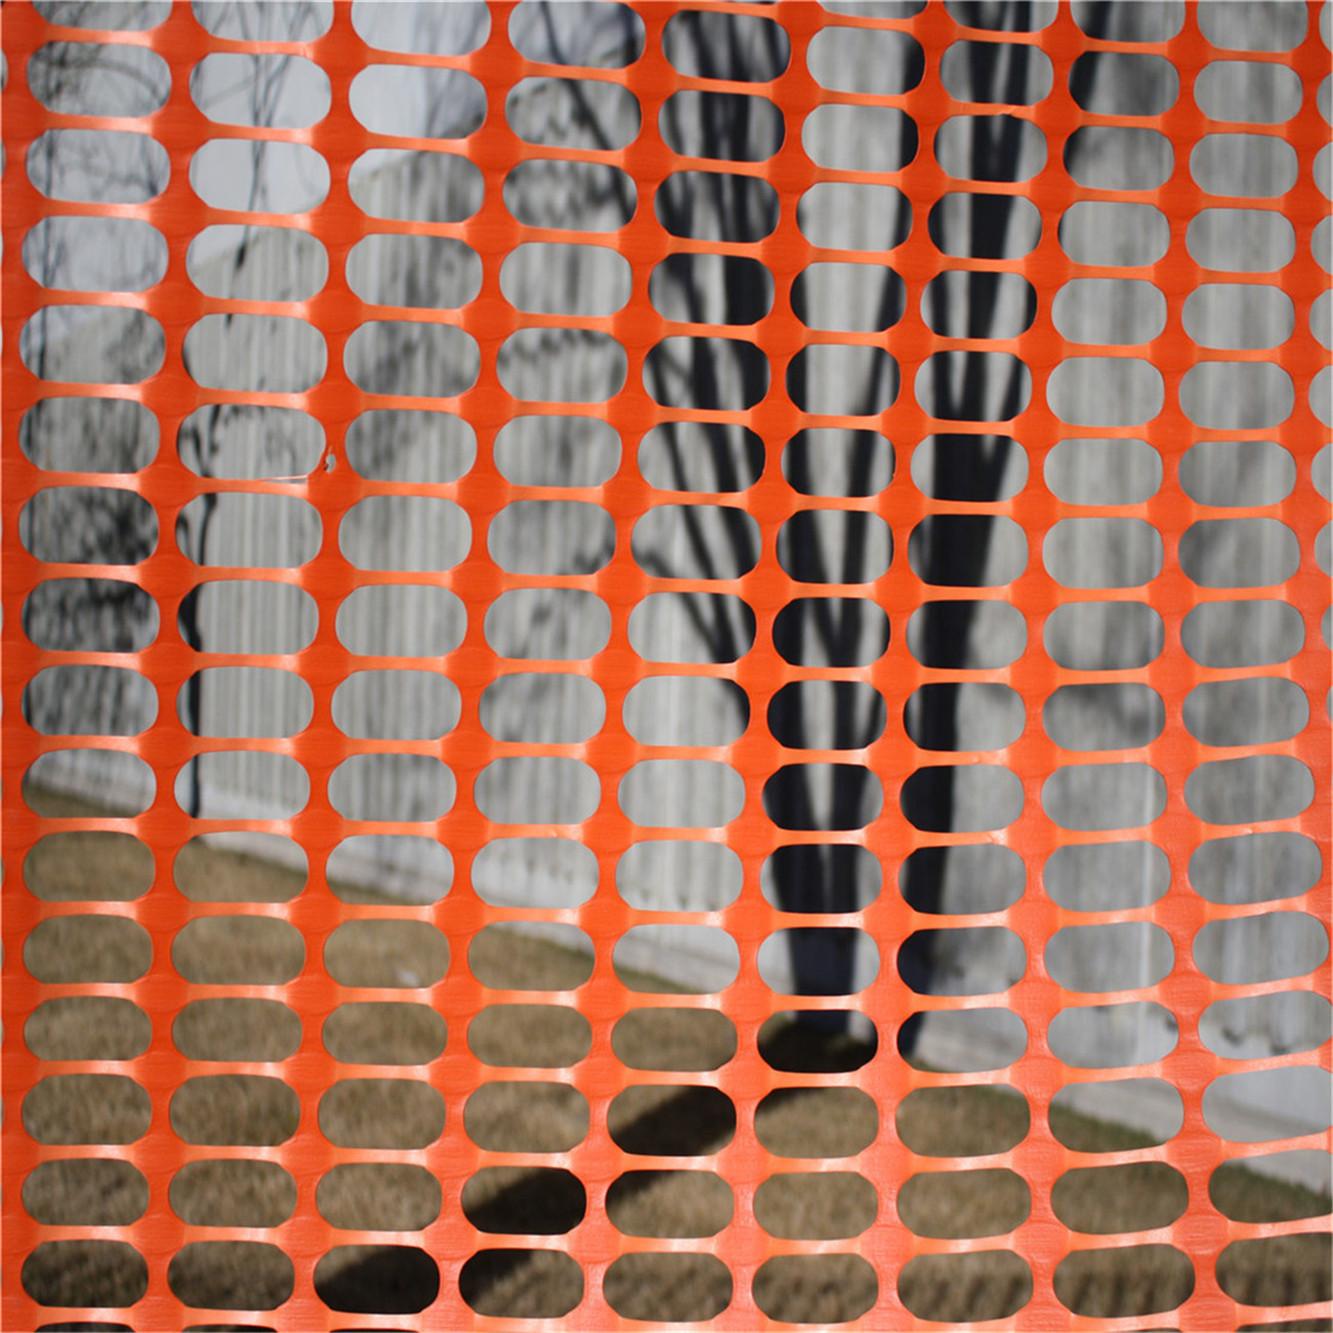 Kunststoffnetz Schneebarriere, Kunststoff-Schutzzaun Net